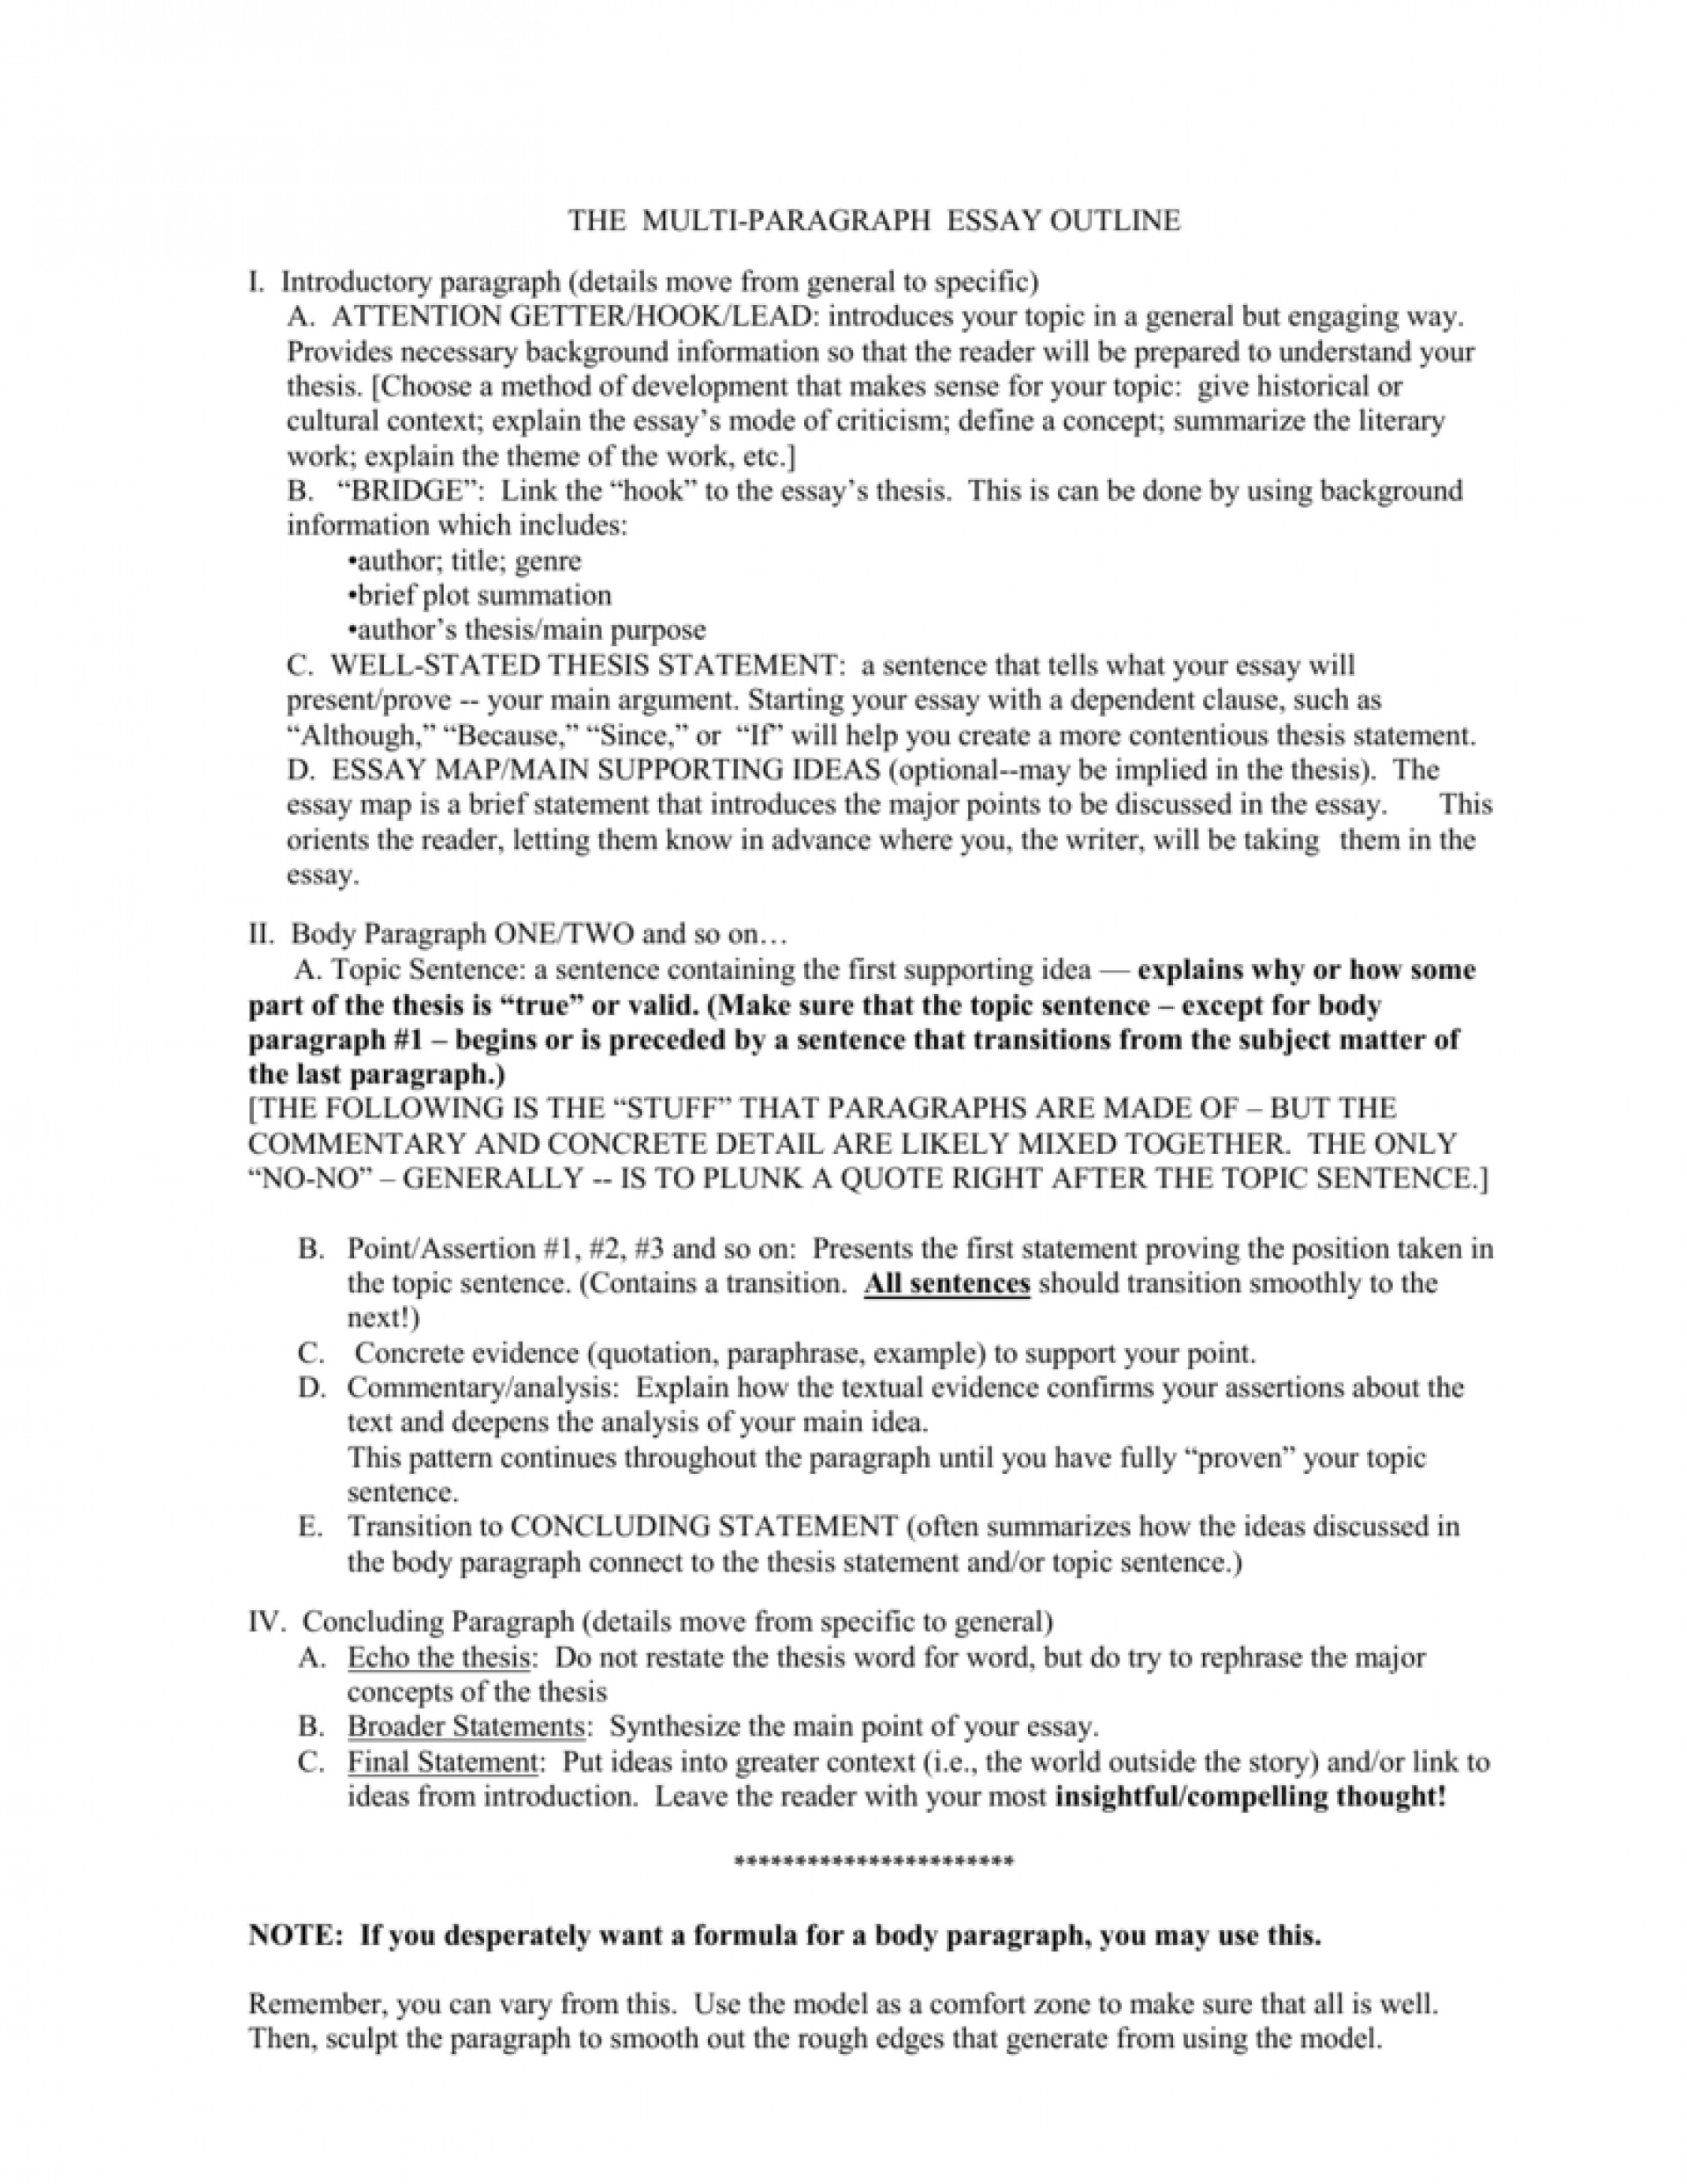 008 009020709 1 Essay Example Multi Best Paragraph Graphic Organizer Format 1920